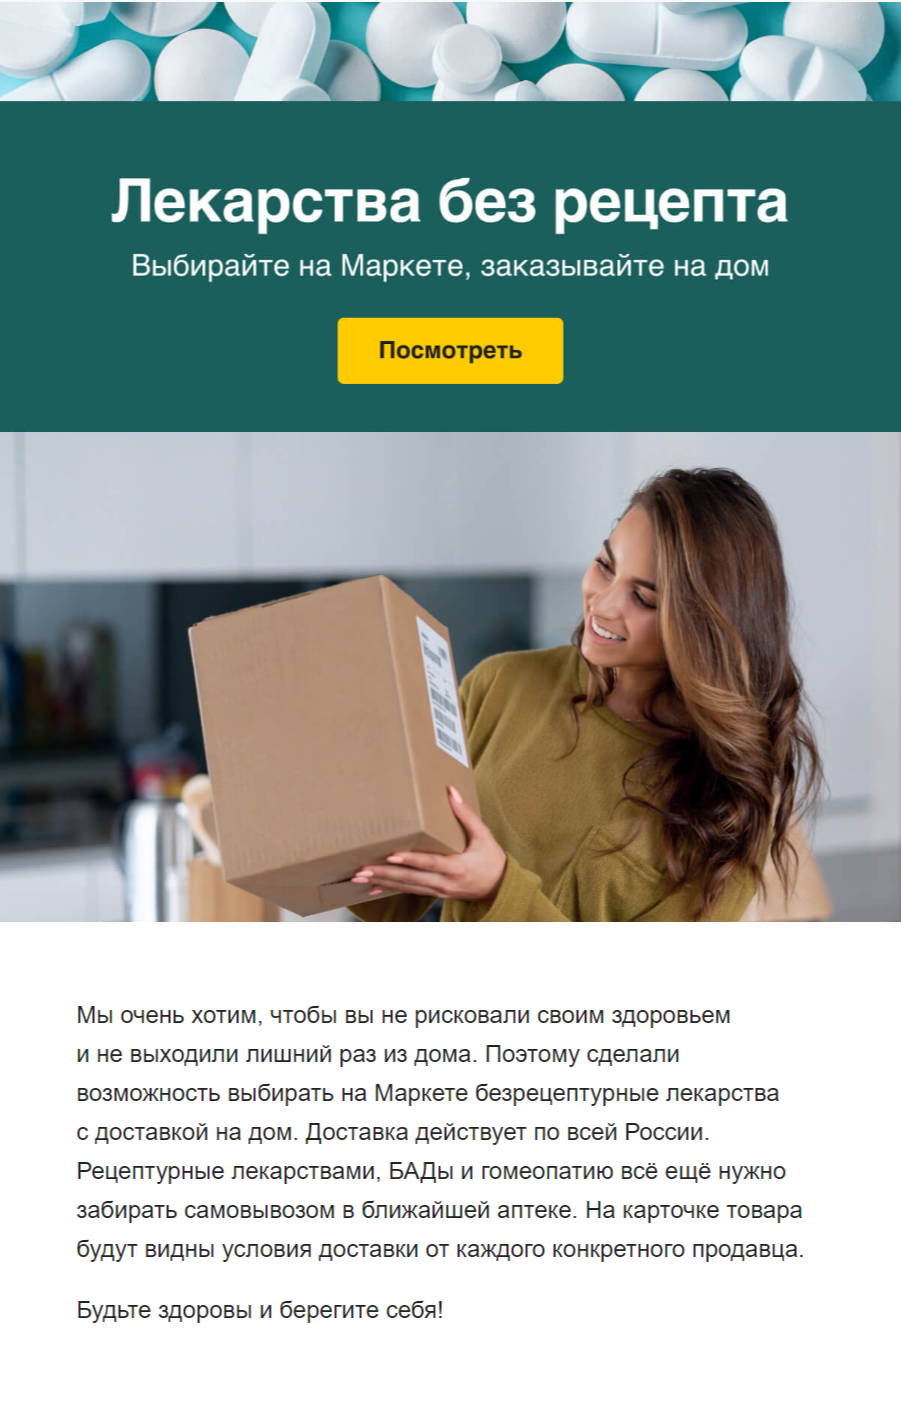 Письмо про заказы онлайн